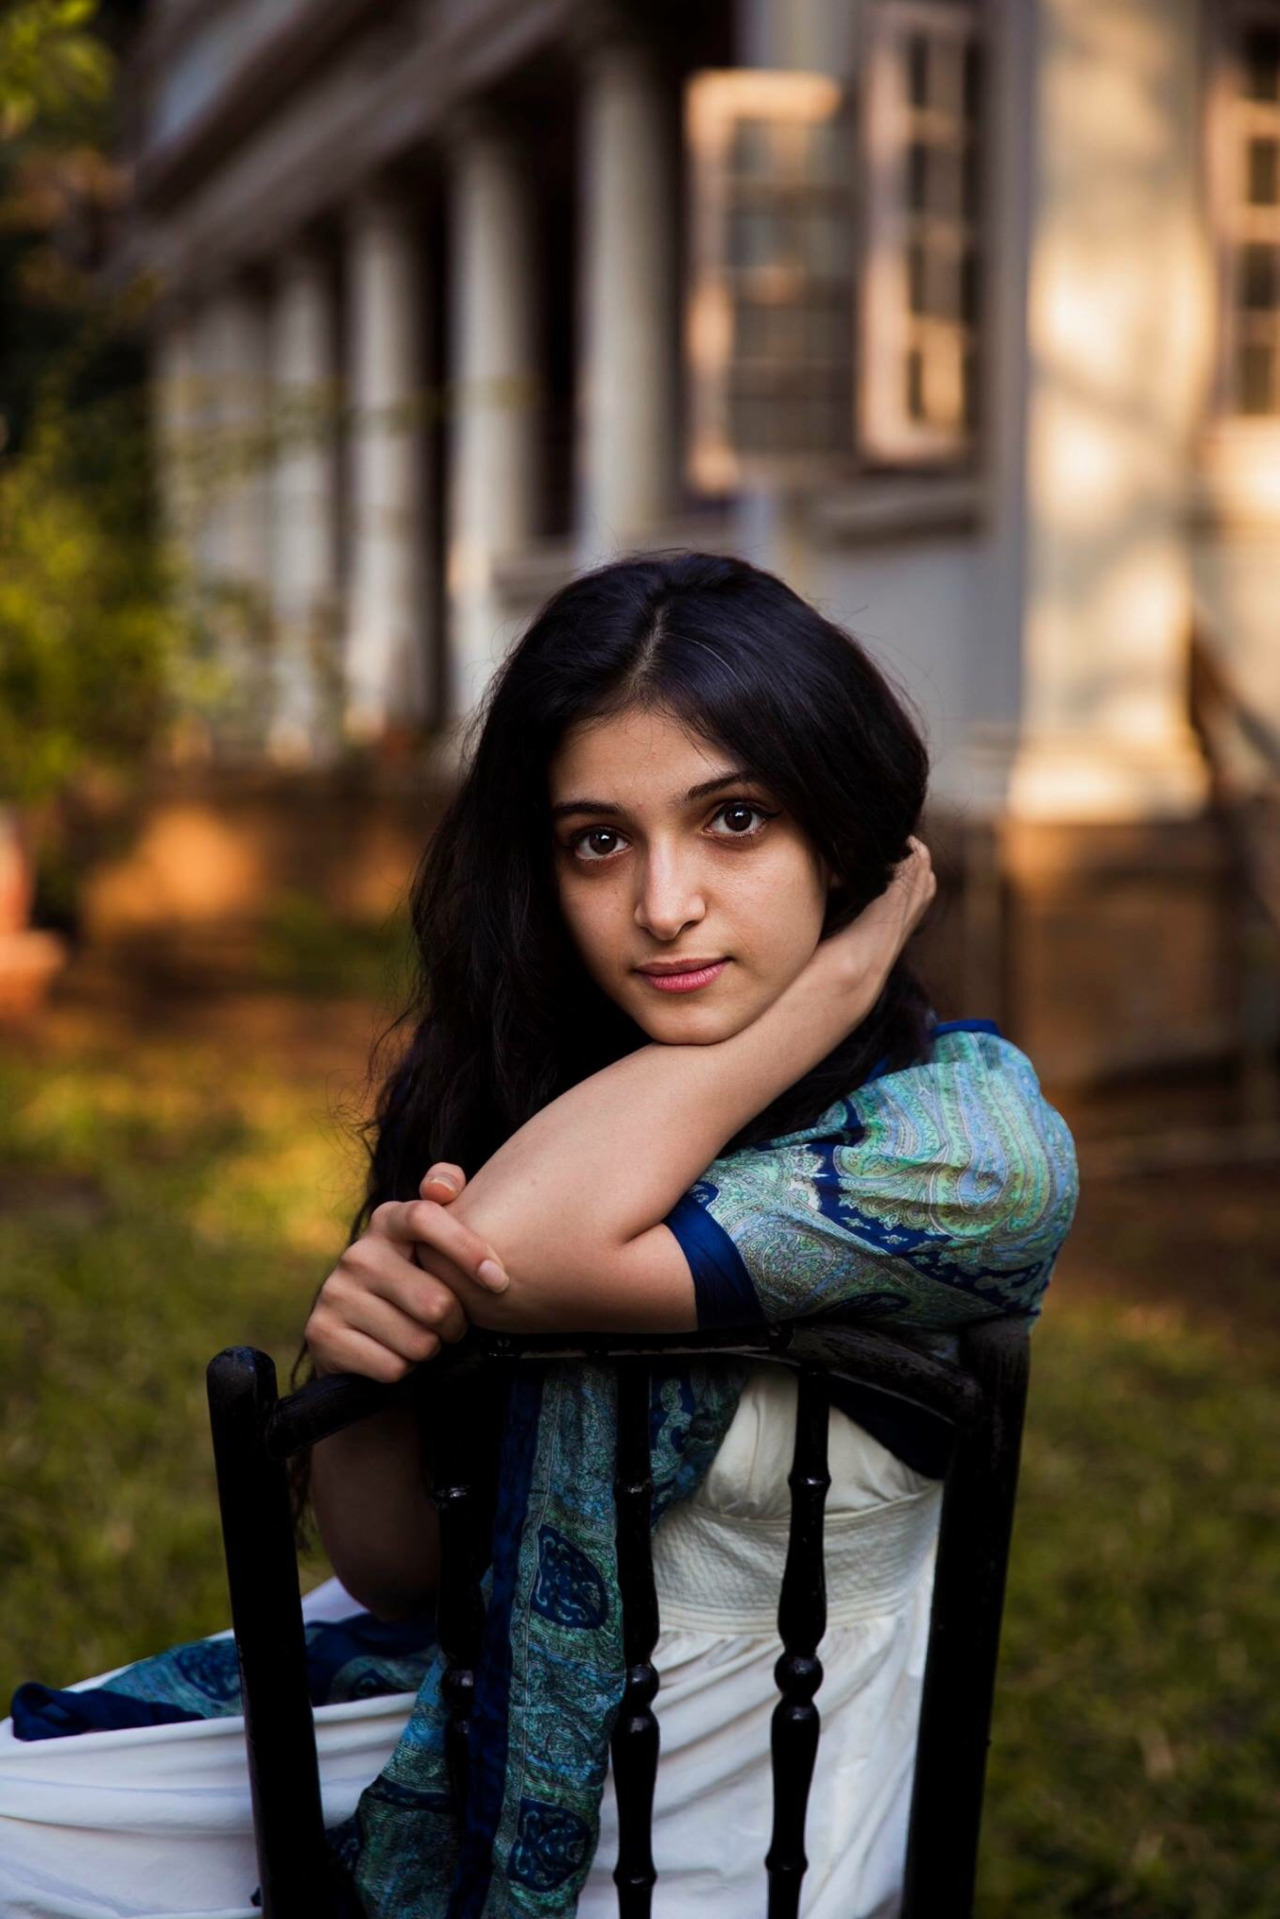 Mihaela Noroc mujer parsi bombay india